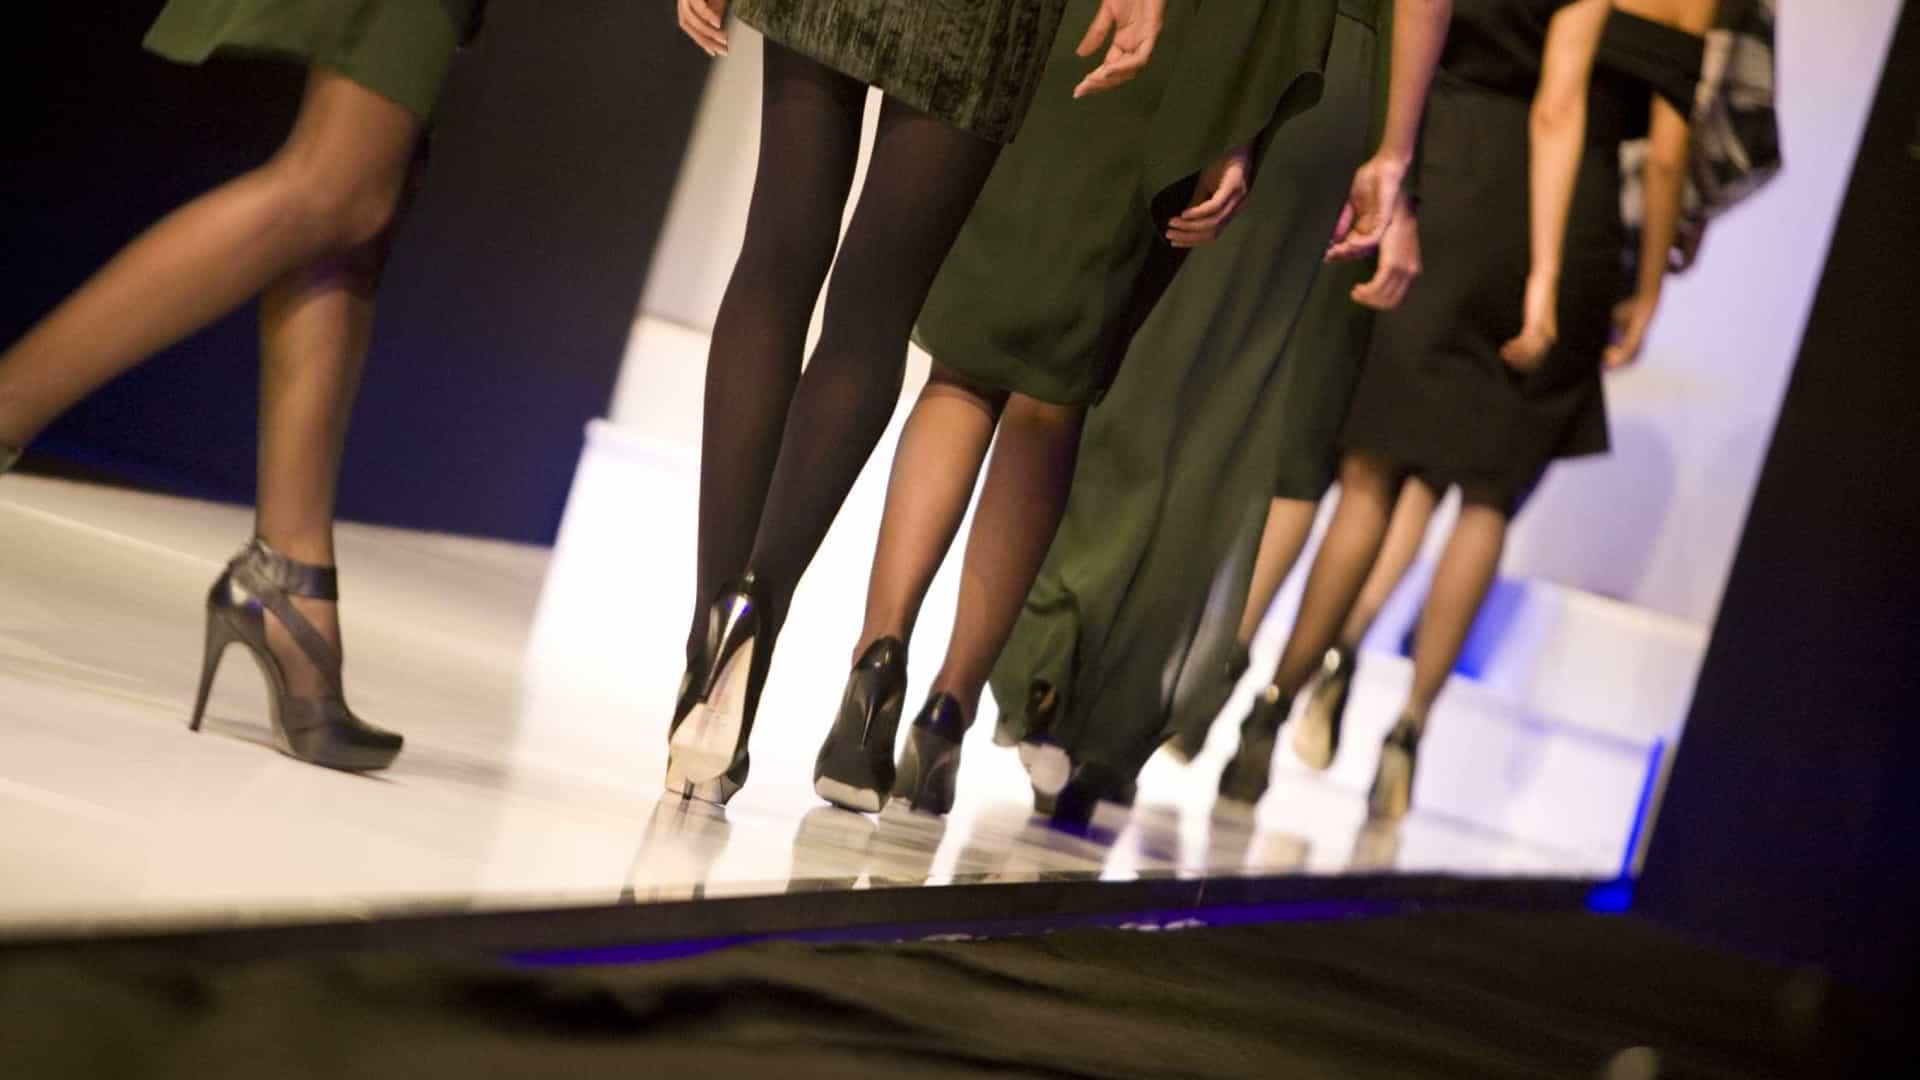 Joias, roupa e lingerie portuguesas em destaque em Paris